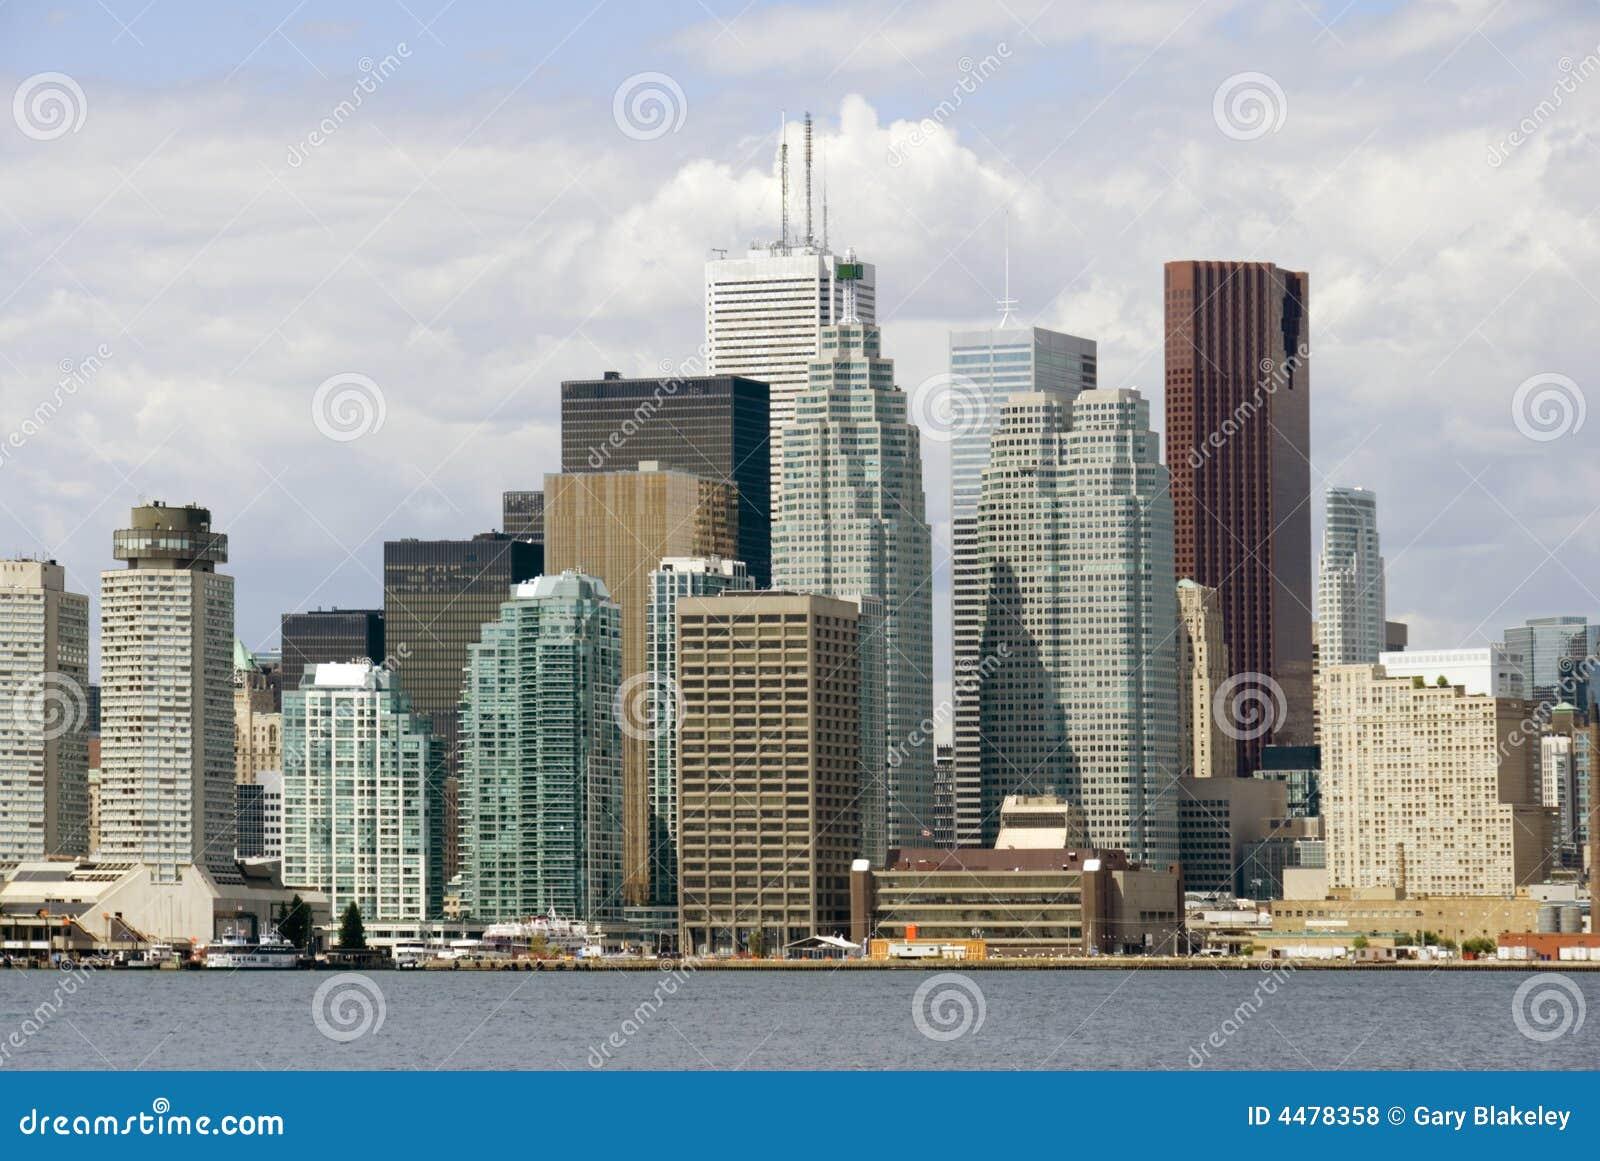 Districto financiero de Toronto